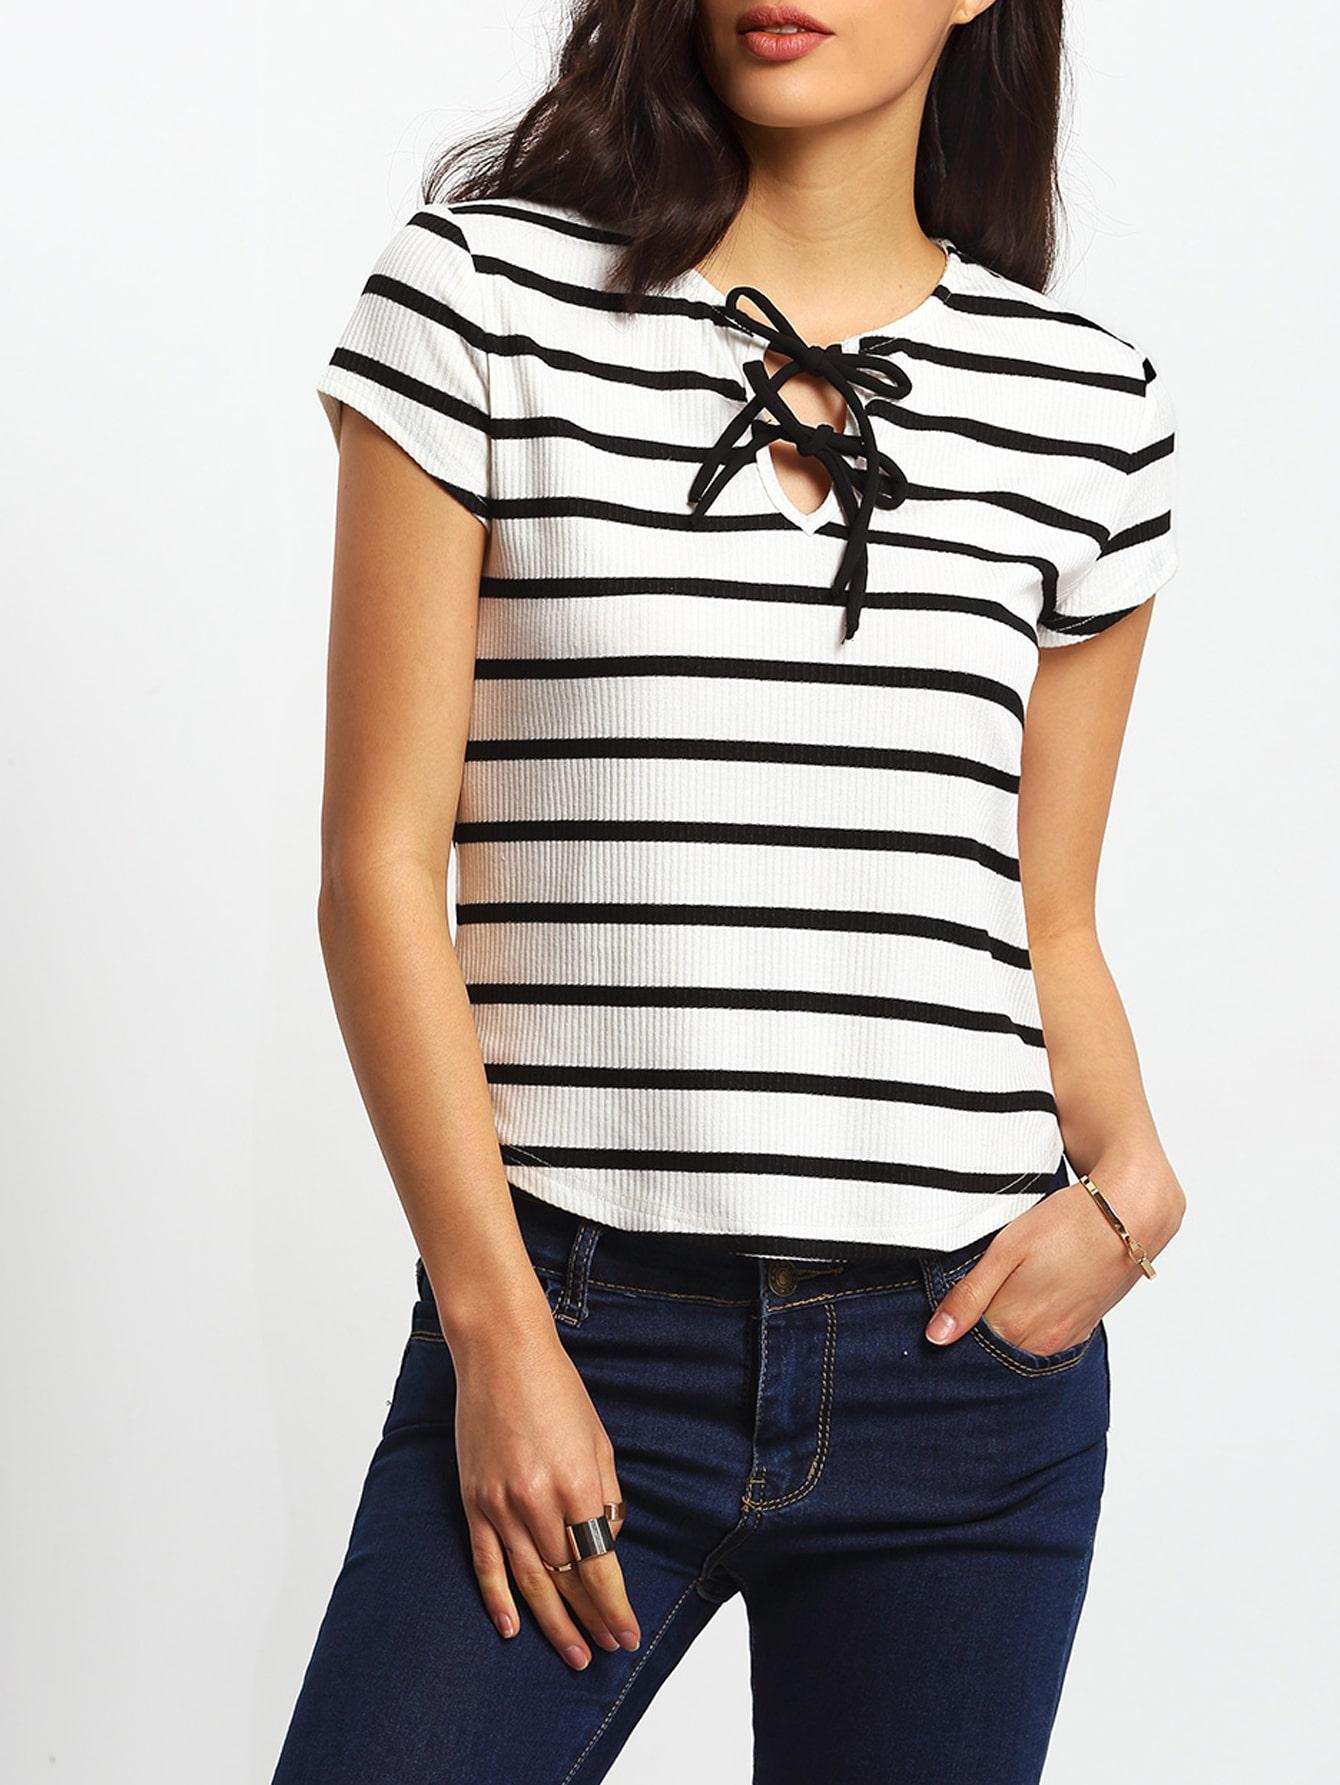 Black White Short Sleeve Self Tie Neck Shirt Shein